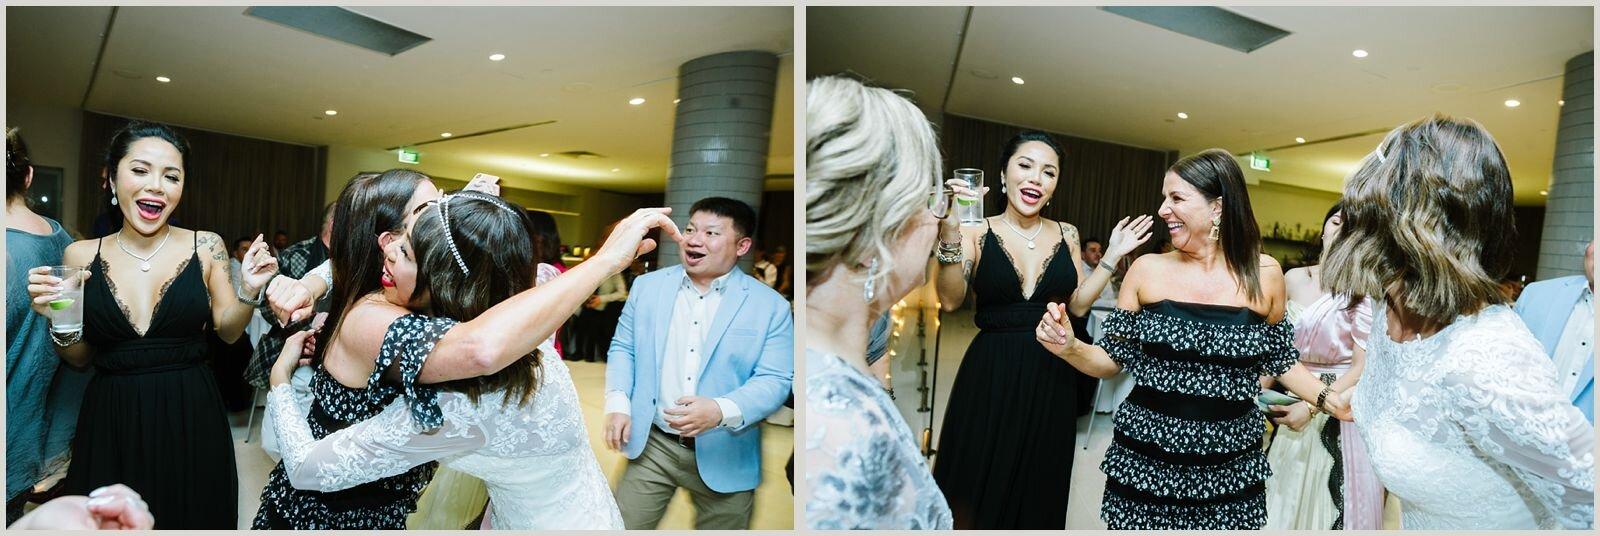 joseph_koprek_wedding_melbourne_the_prince_deck_0081.jpg